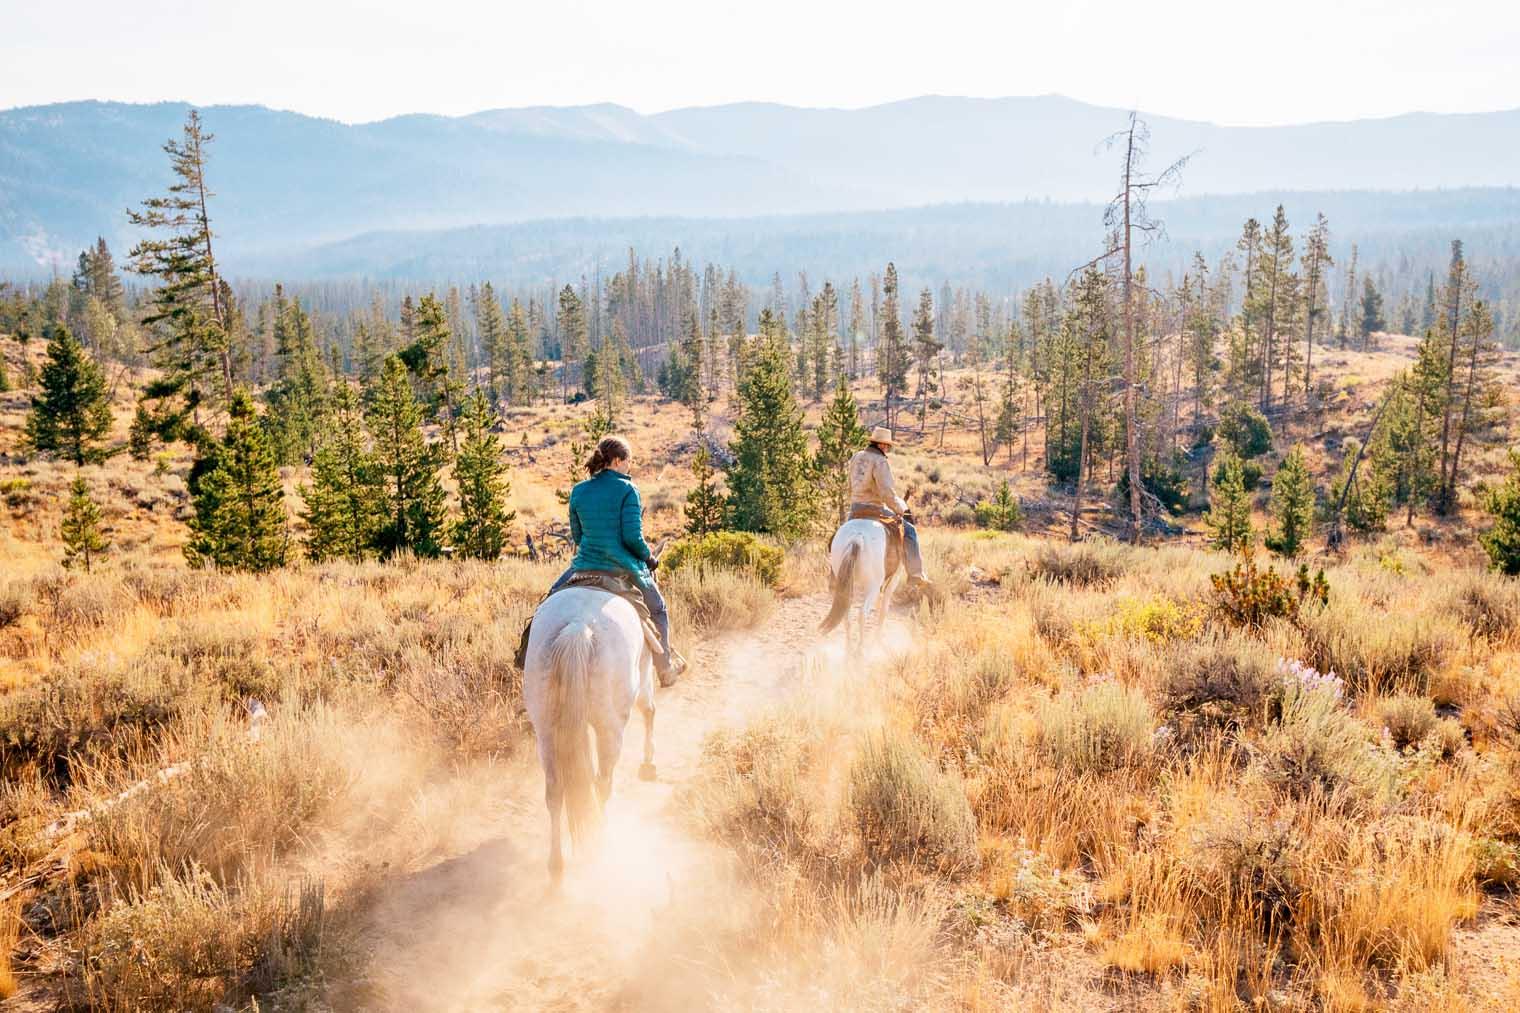 Exploring the Sawtooth Mountains on horseback